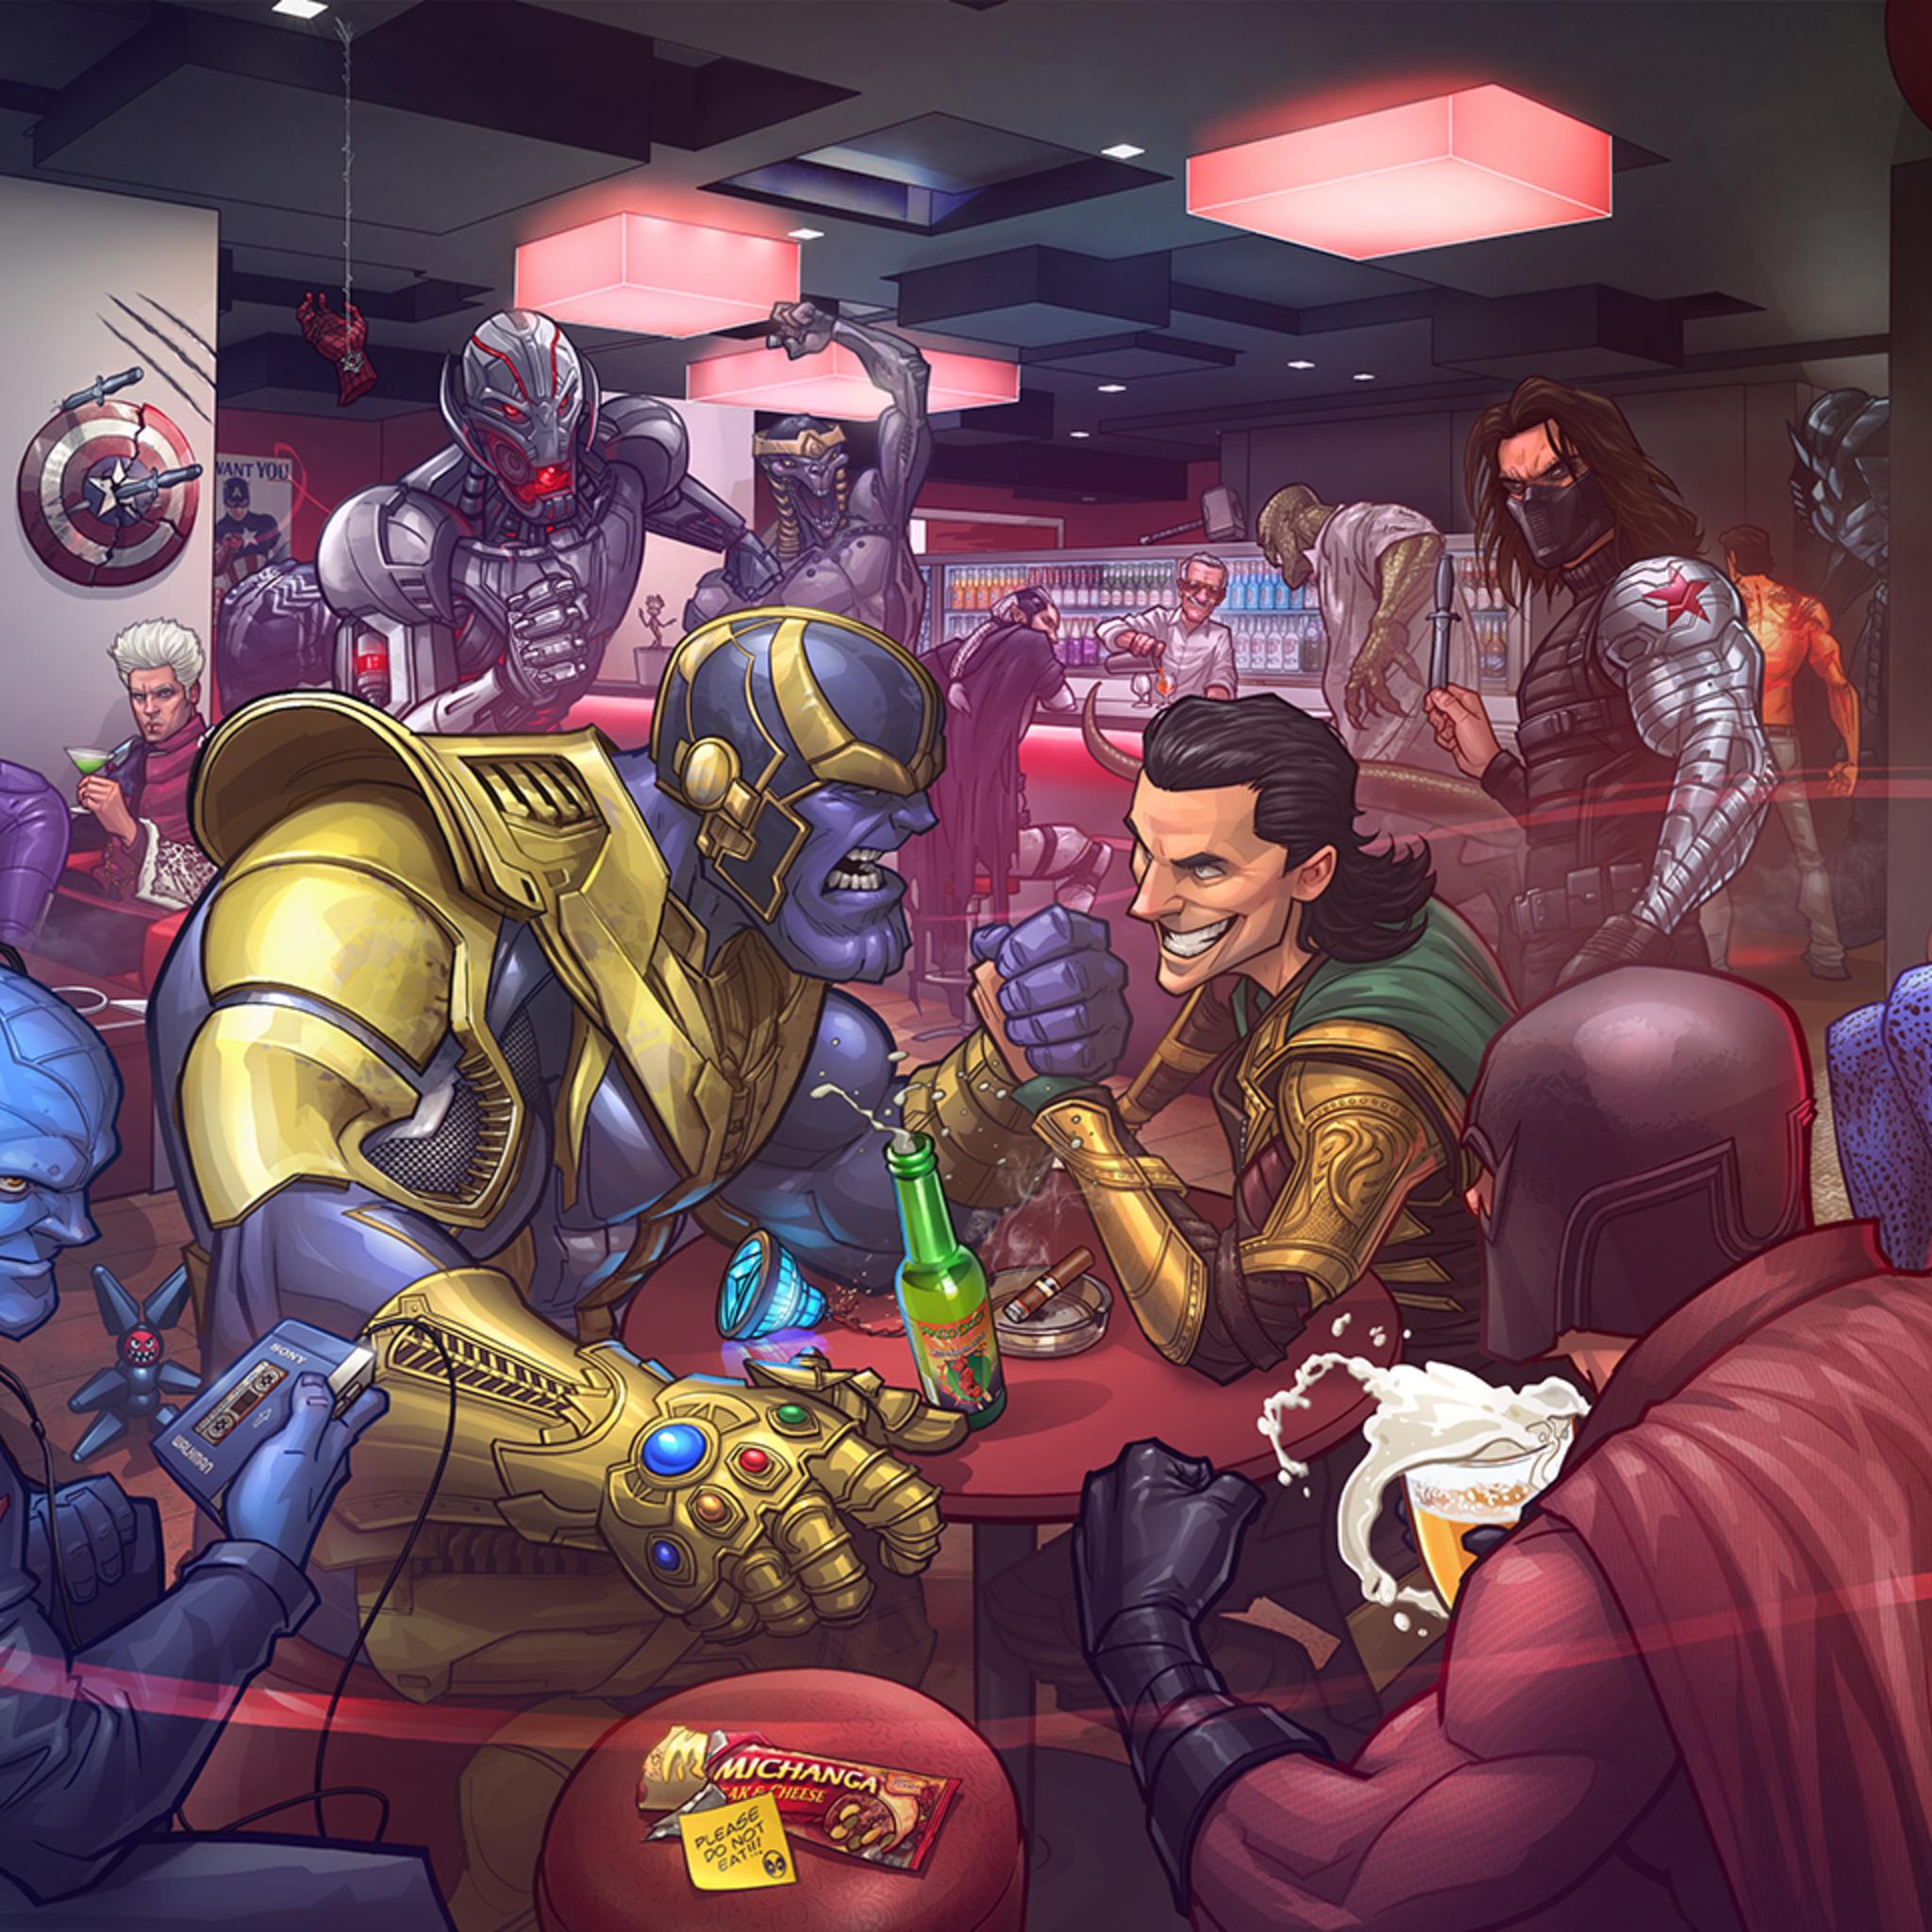 Download Wallpaper Marvel Ipad Air - marvel-villains-jo-2048x2048  Perfect Image Reference_9495.jpg